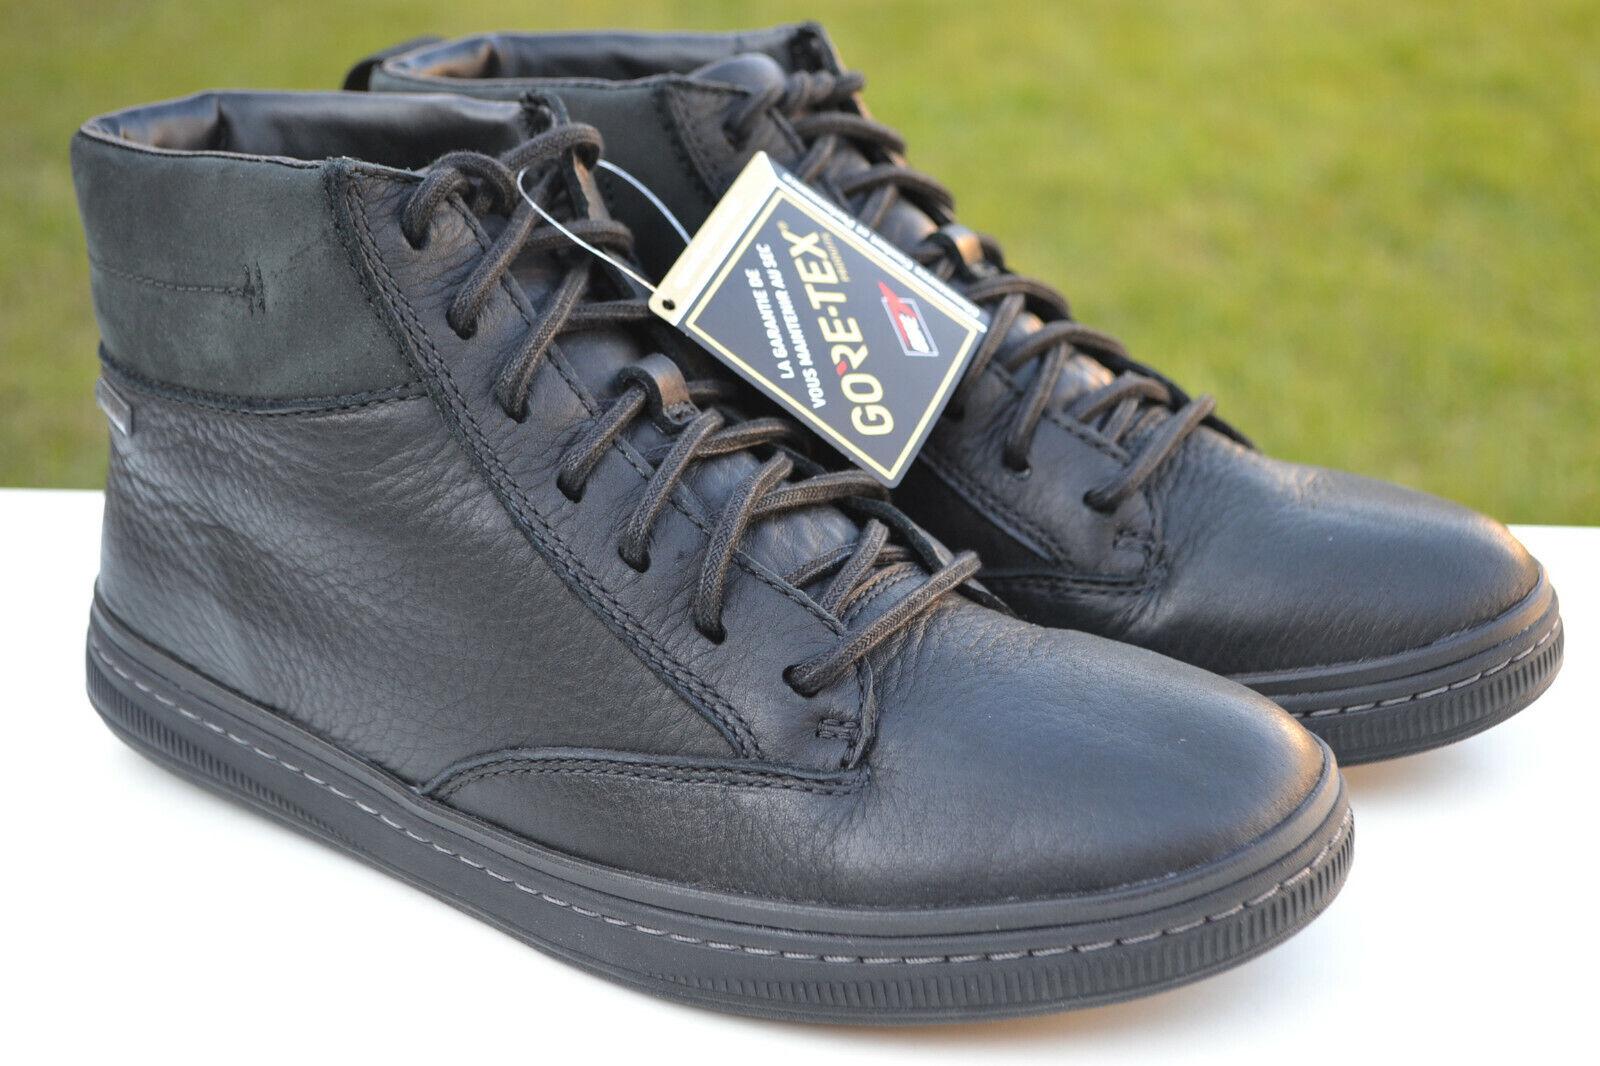 Clarks BNIB Mens Boots NORSEN MID GTX Black Leather UK 10 / 44.5